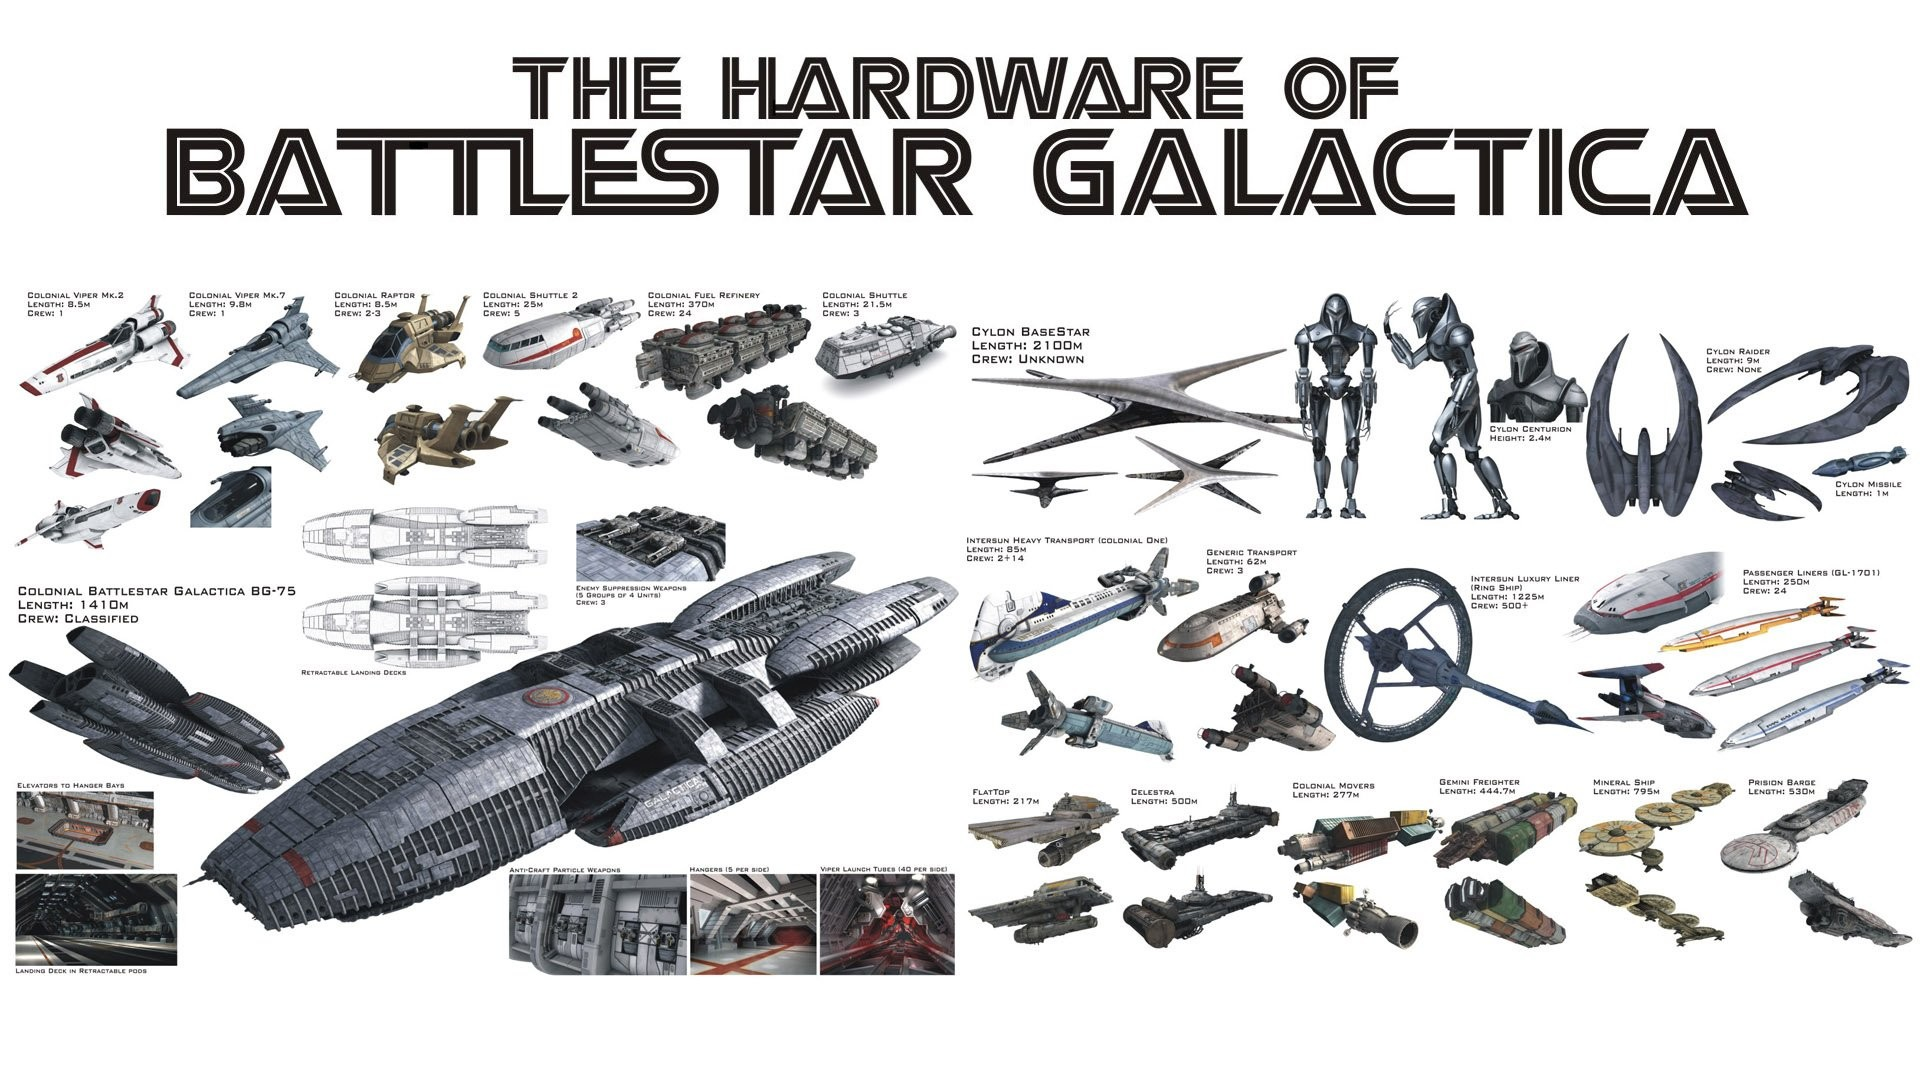 BATTLESTAR GALACTICA action adventure drama sci-fi spaceship poster  wallpaper     264955   WallpaperUP